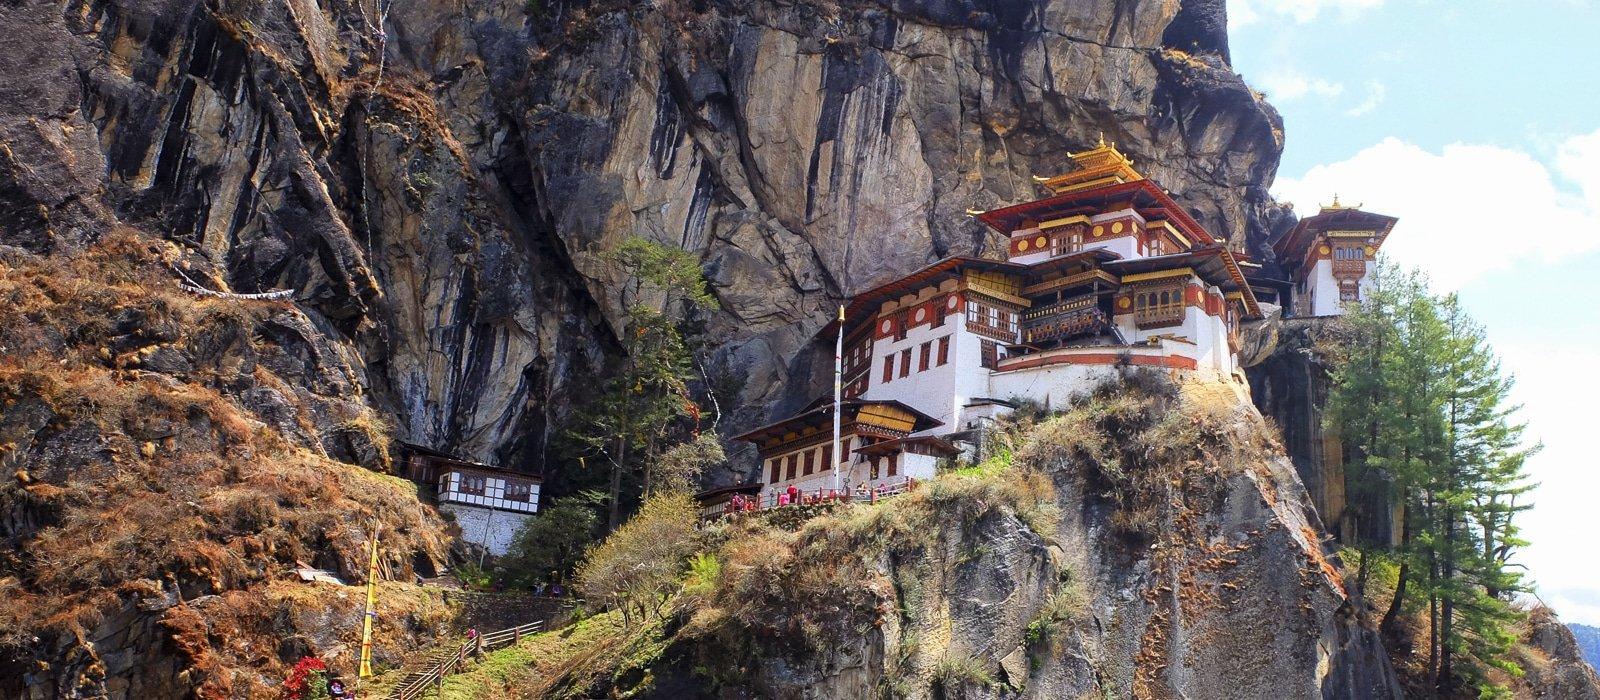 img-diapo-entete - Nepal-bouthan-1600x700-12.jpg